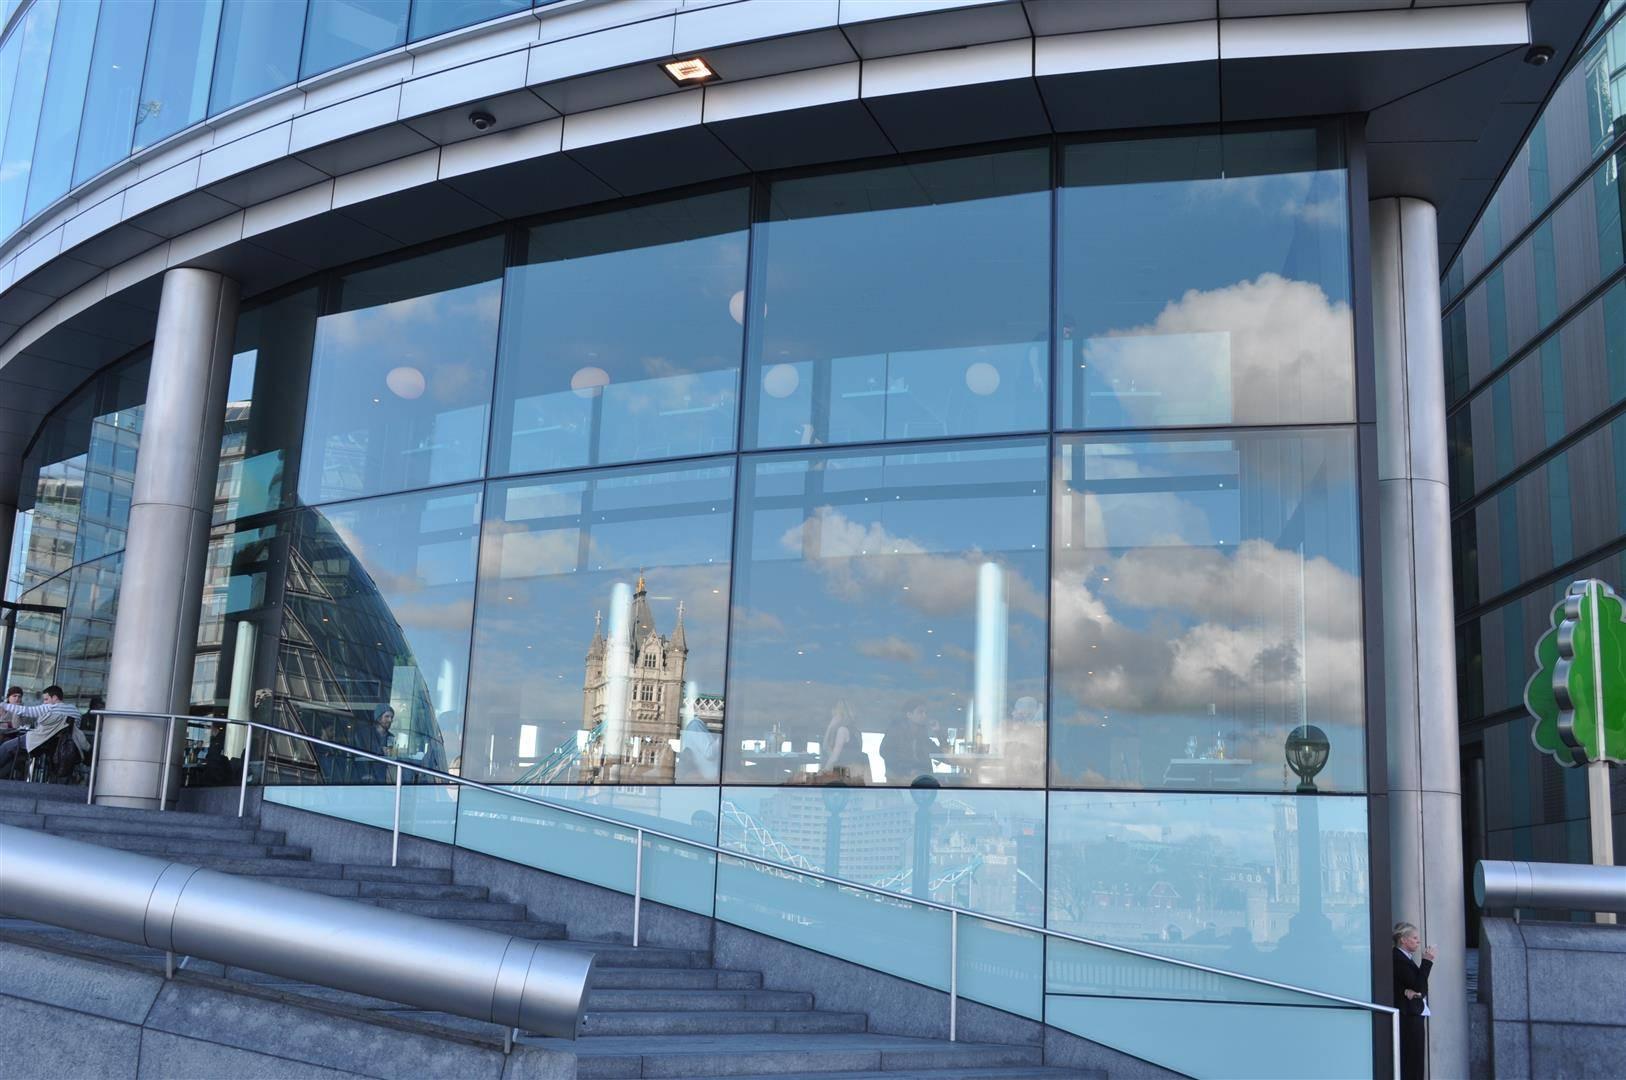 Tower Bridge Reflection, Queen's Walk, Thames River, London